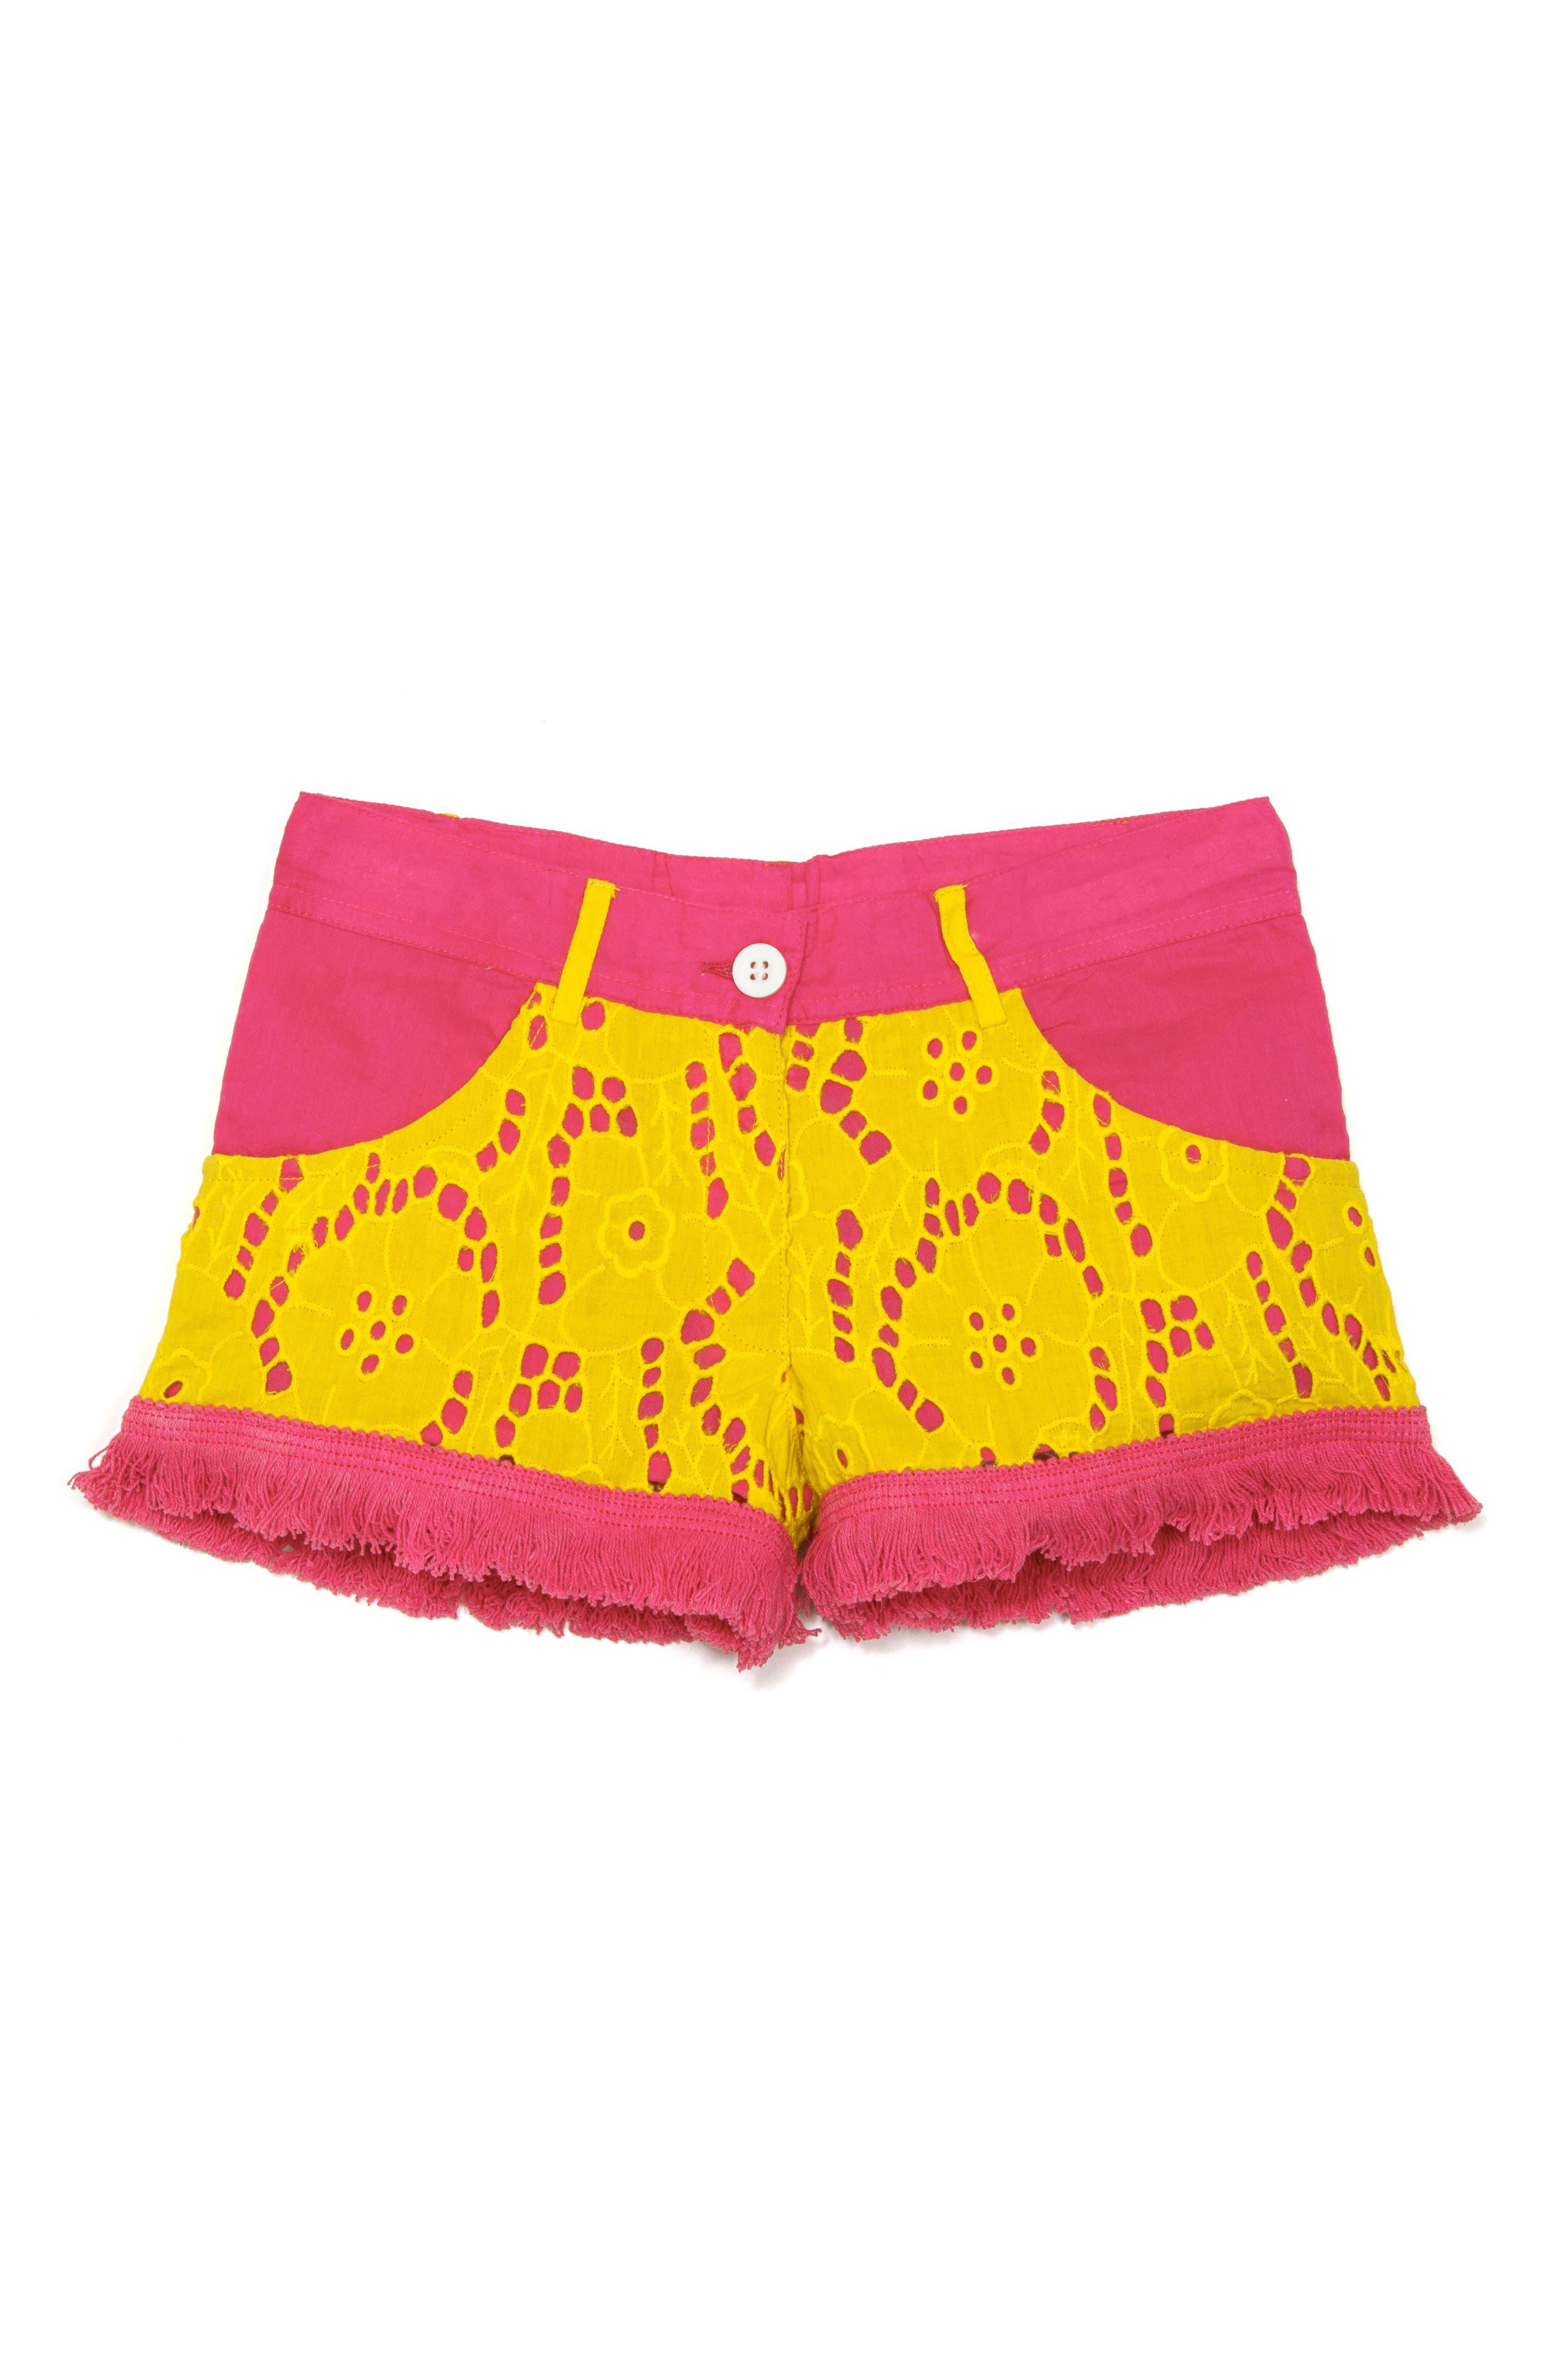 Alternate Image 1 Selected - Masasla Baby Eyelet Shorts (Toddler Girls, Little Girls & Big Girls)